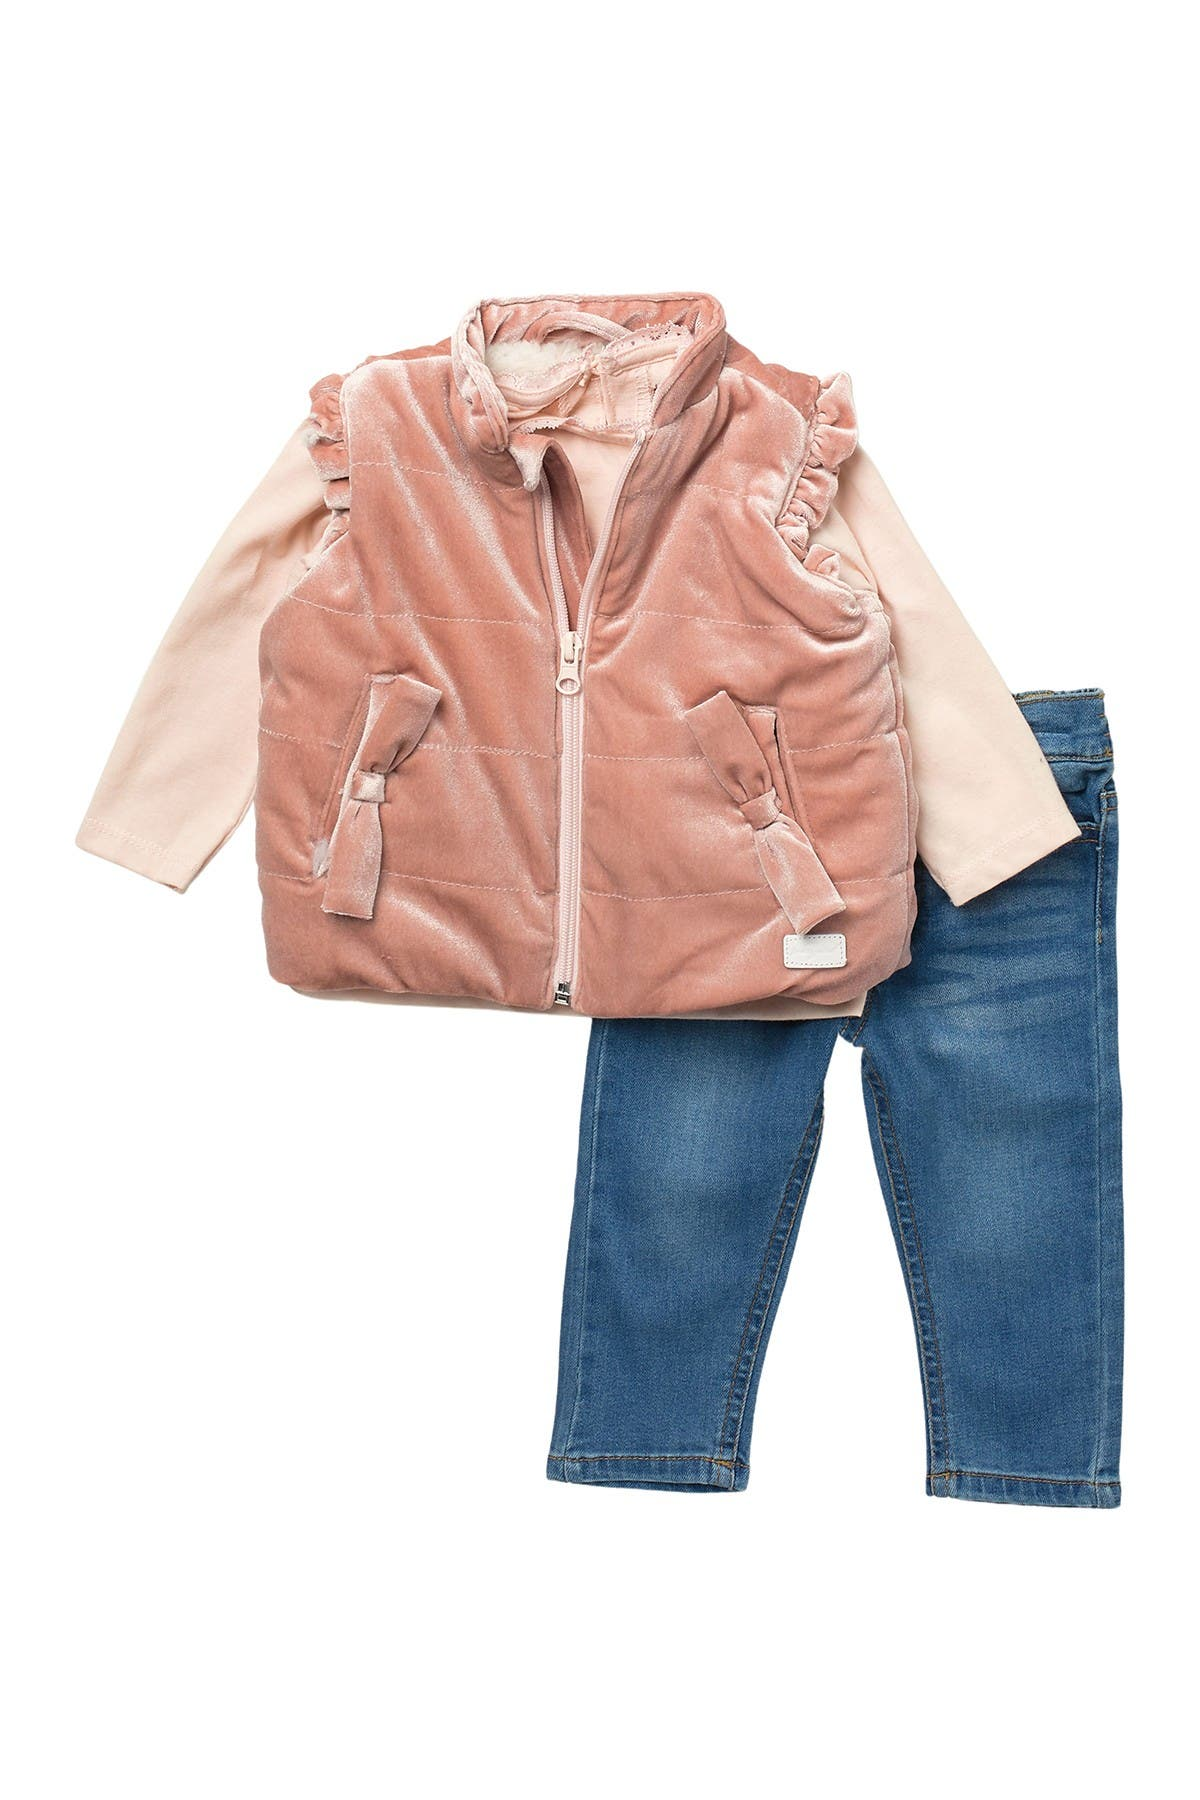 Image of 7 For All Mankind Velvet Vest, Tee, & Jeans Set